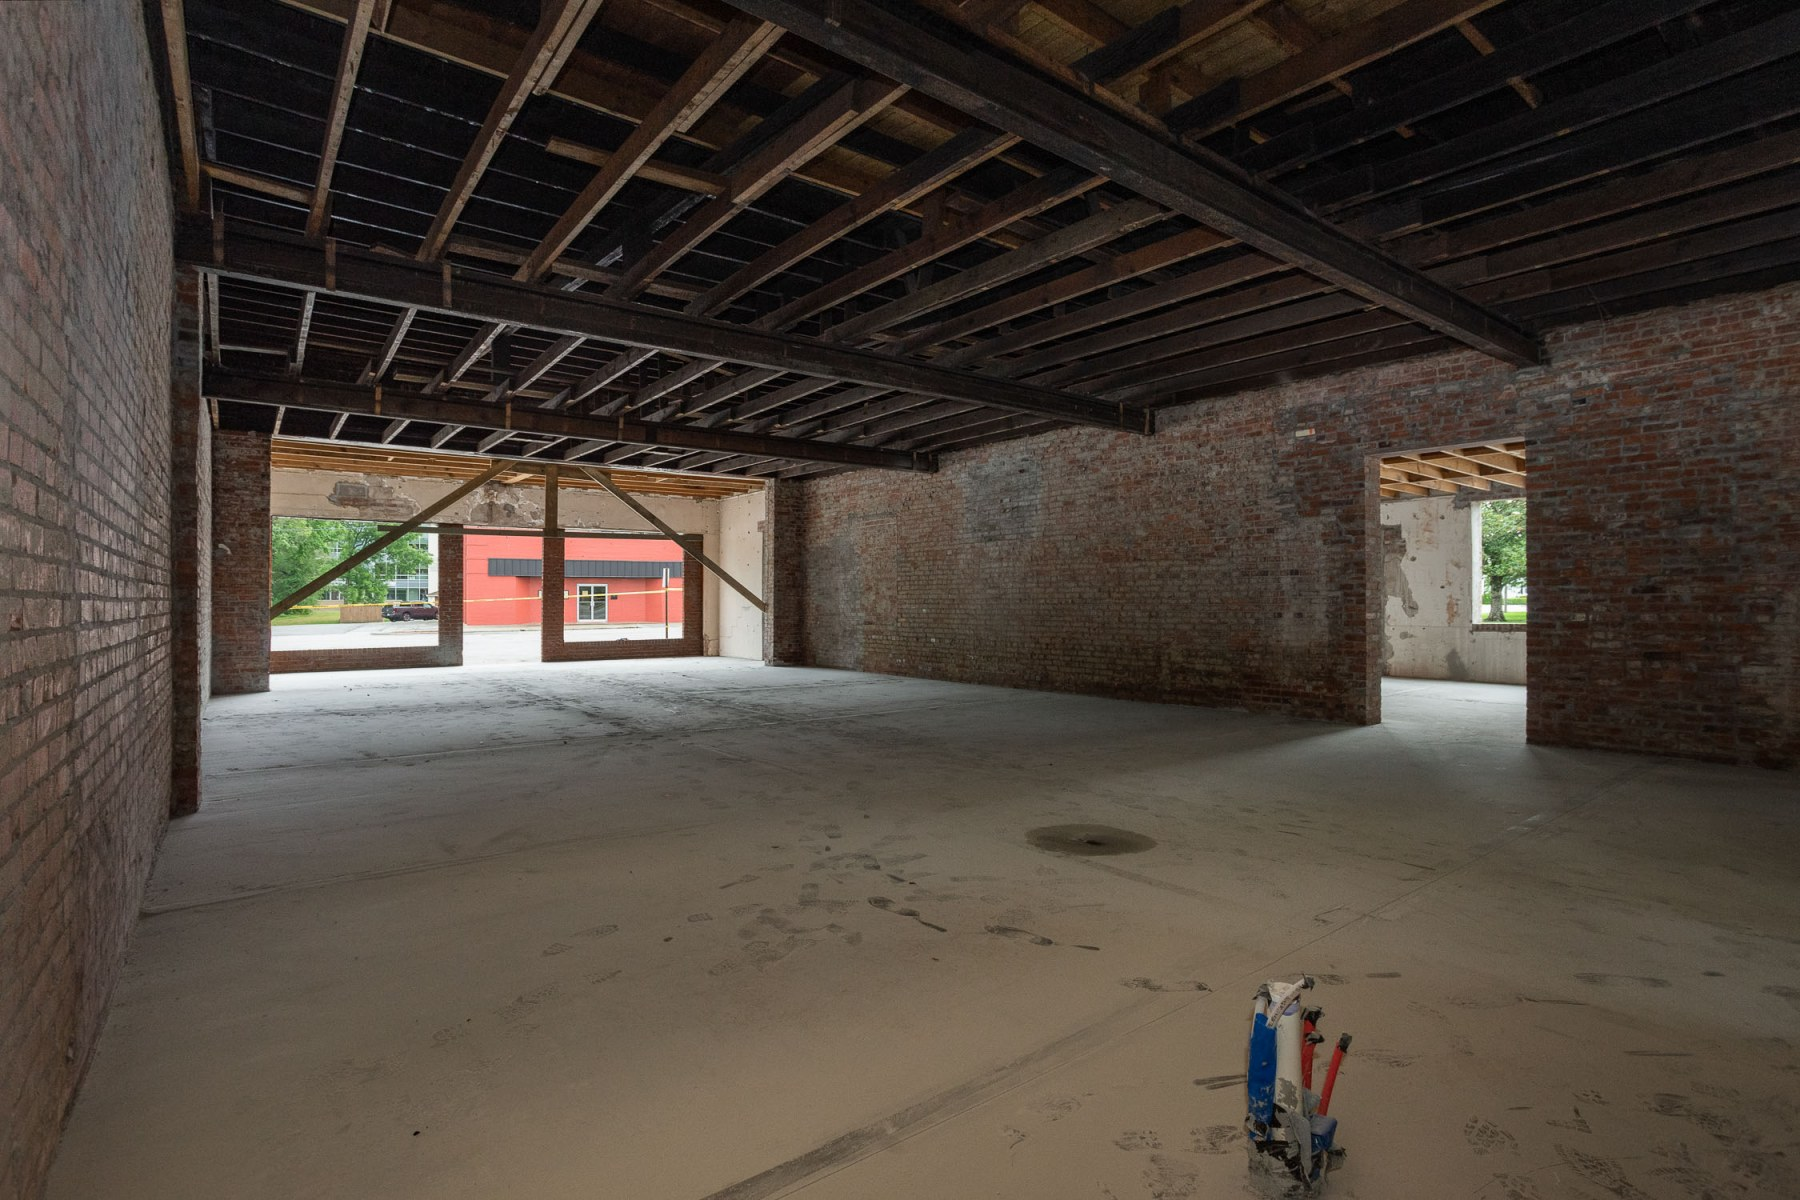 503-New-Bridge-St-Construction-3-25Jun2021_SB_04395_web-size